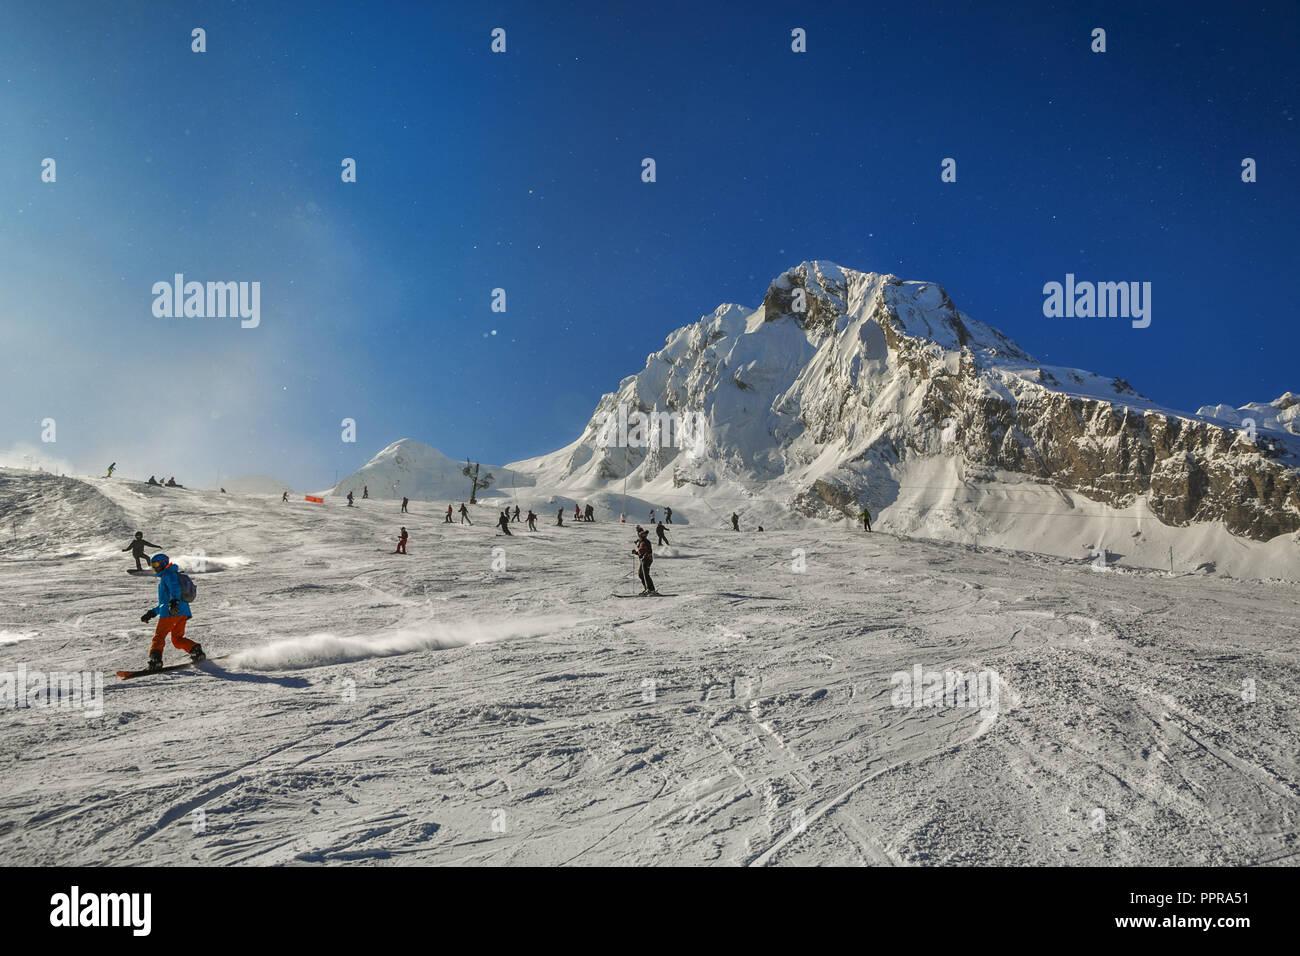 Gourette ski resort, Pyrenees Atlantiques, Aquitaine region, Ossau Valley, France - Stock Image